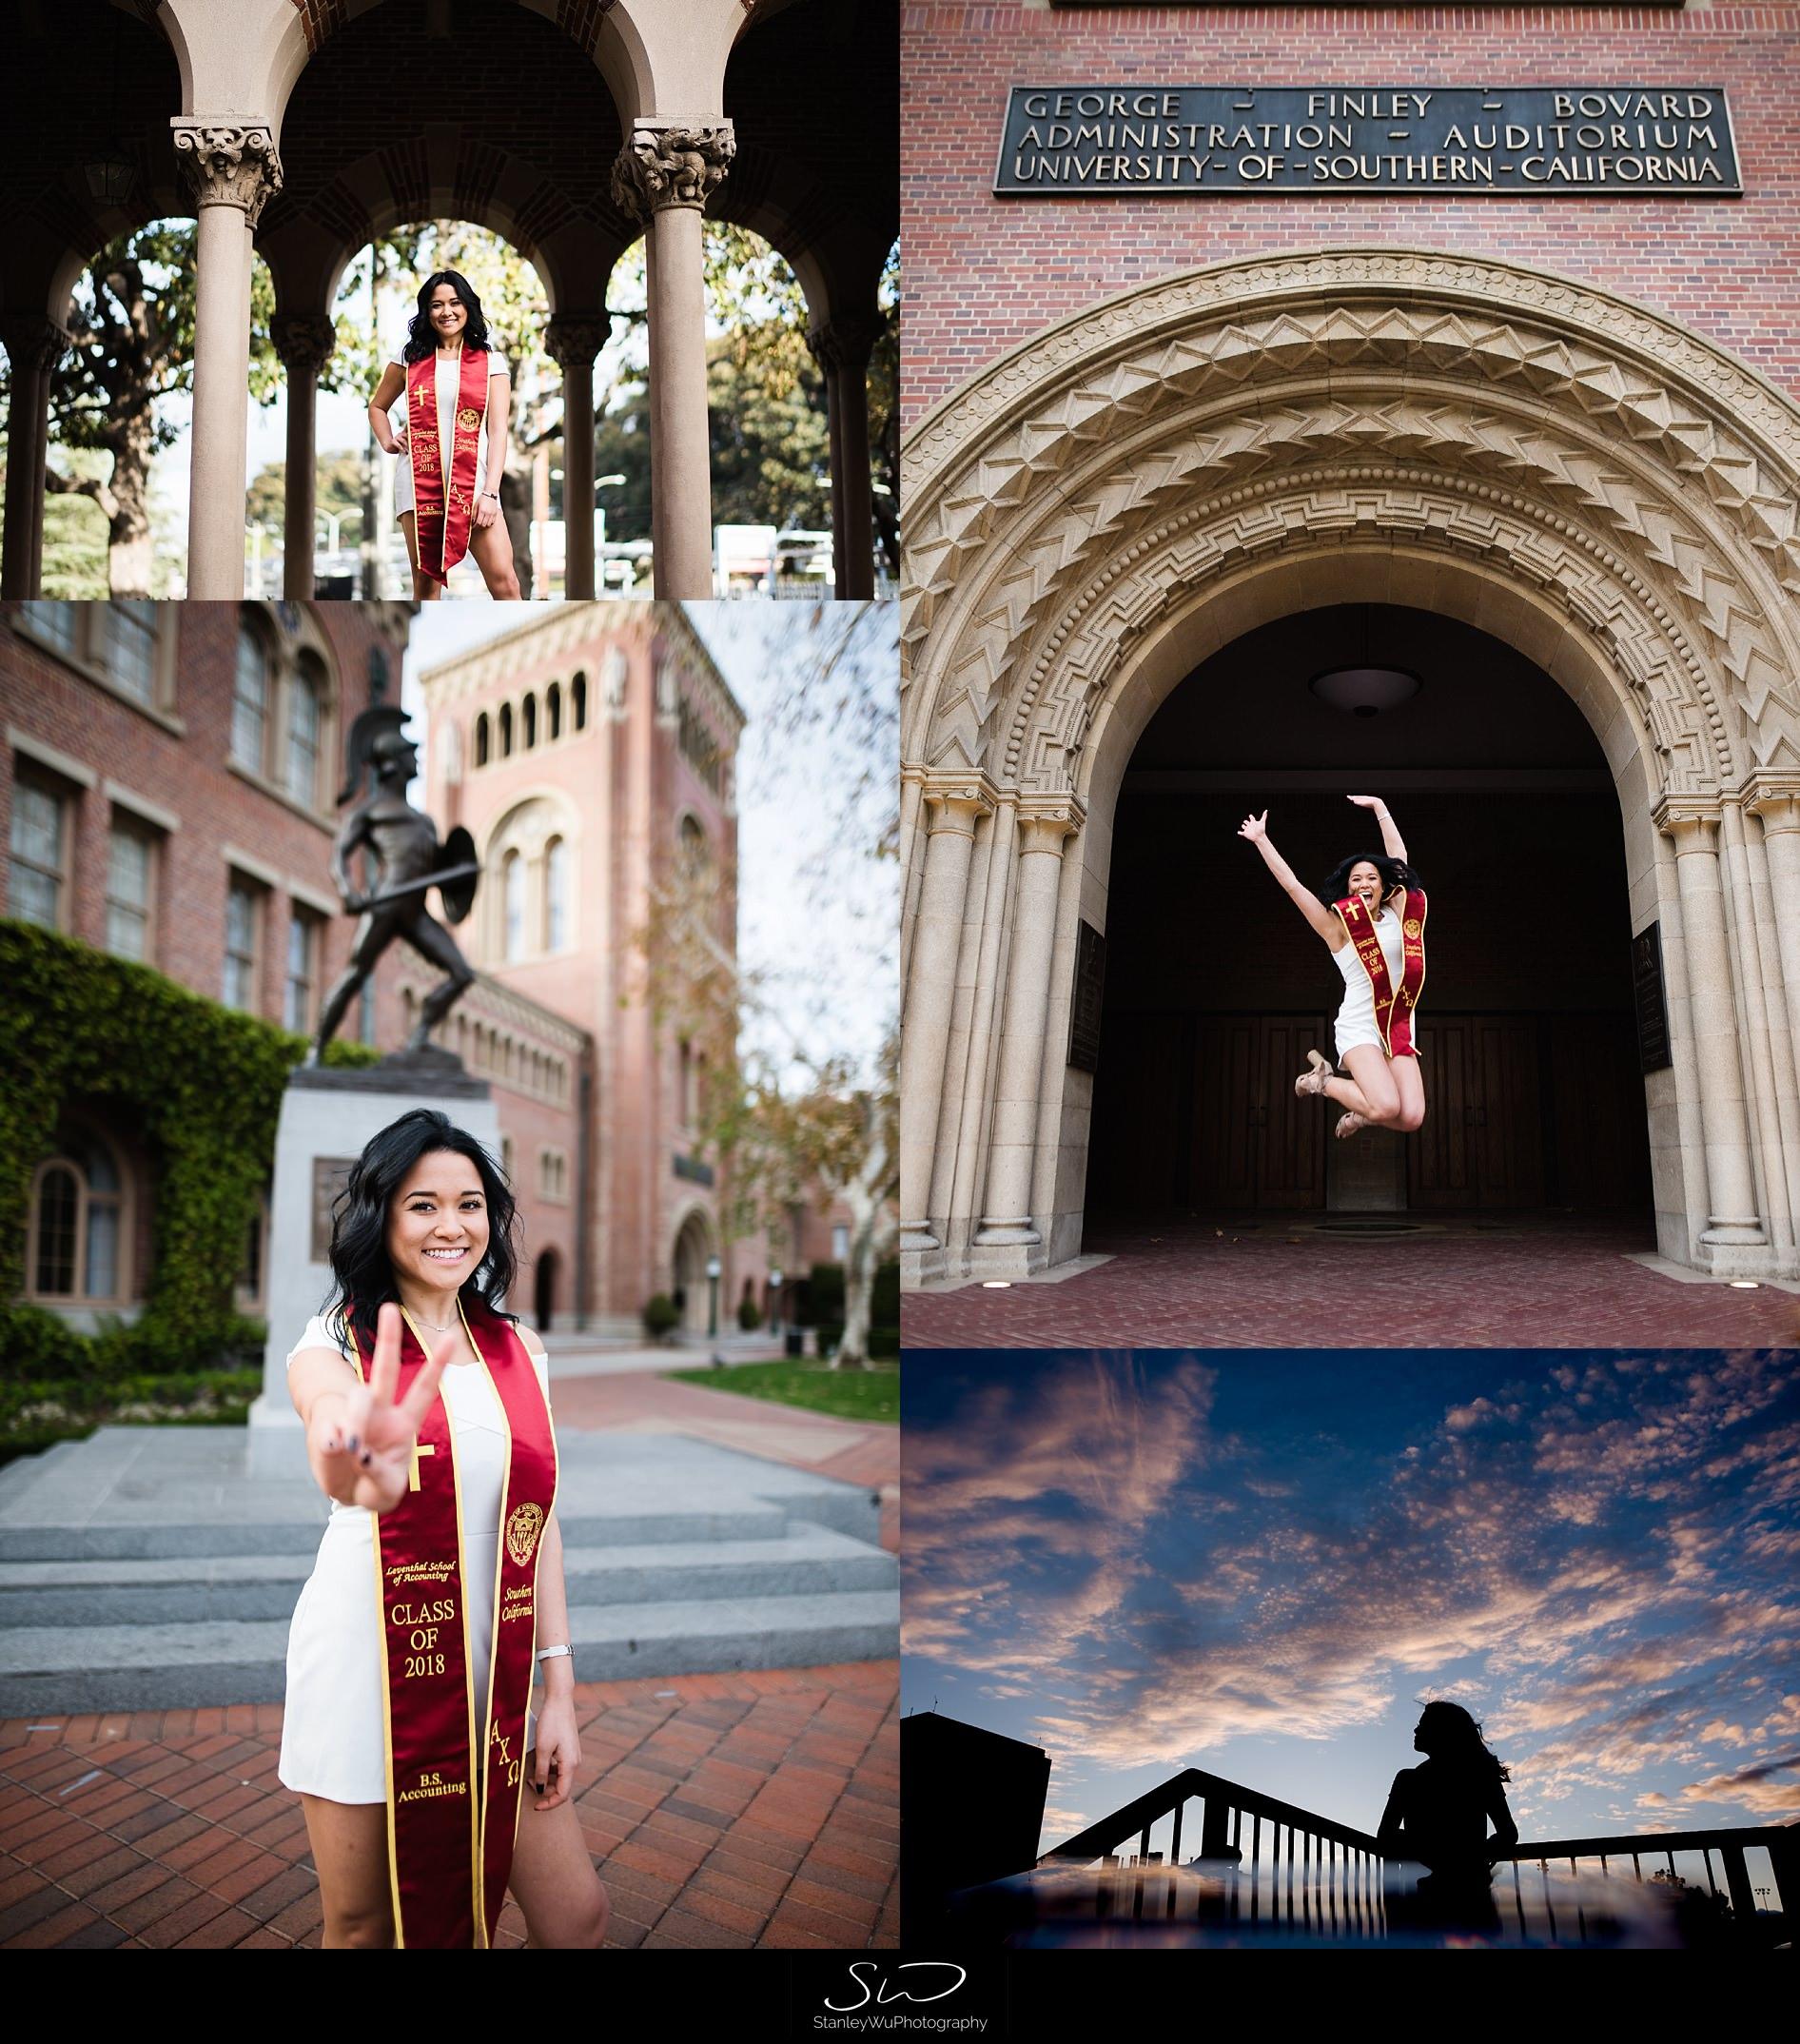 collage-los-angeles-usc-graduation-senior-portraits_0032.jpg